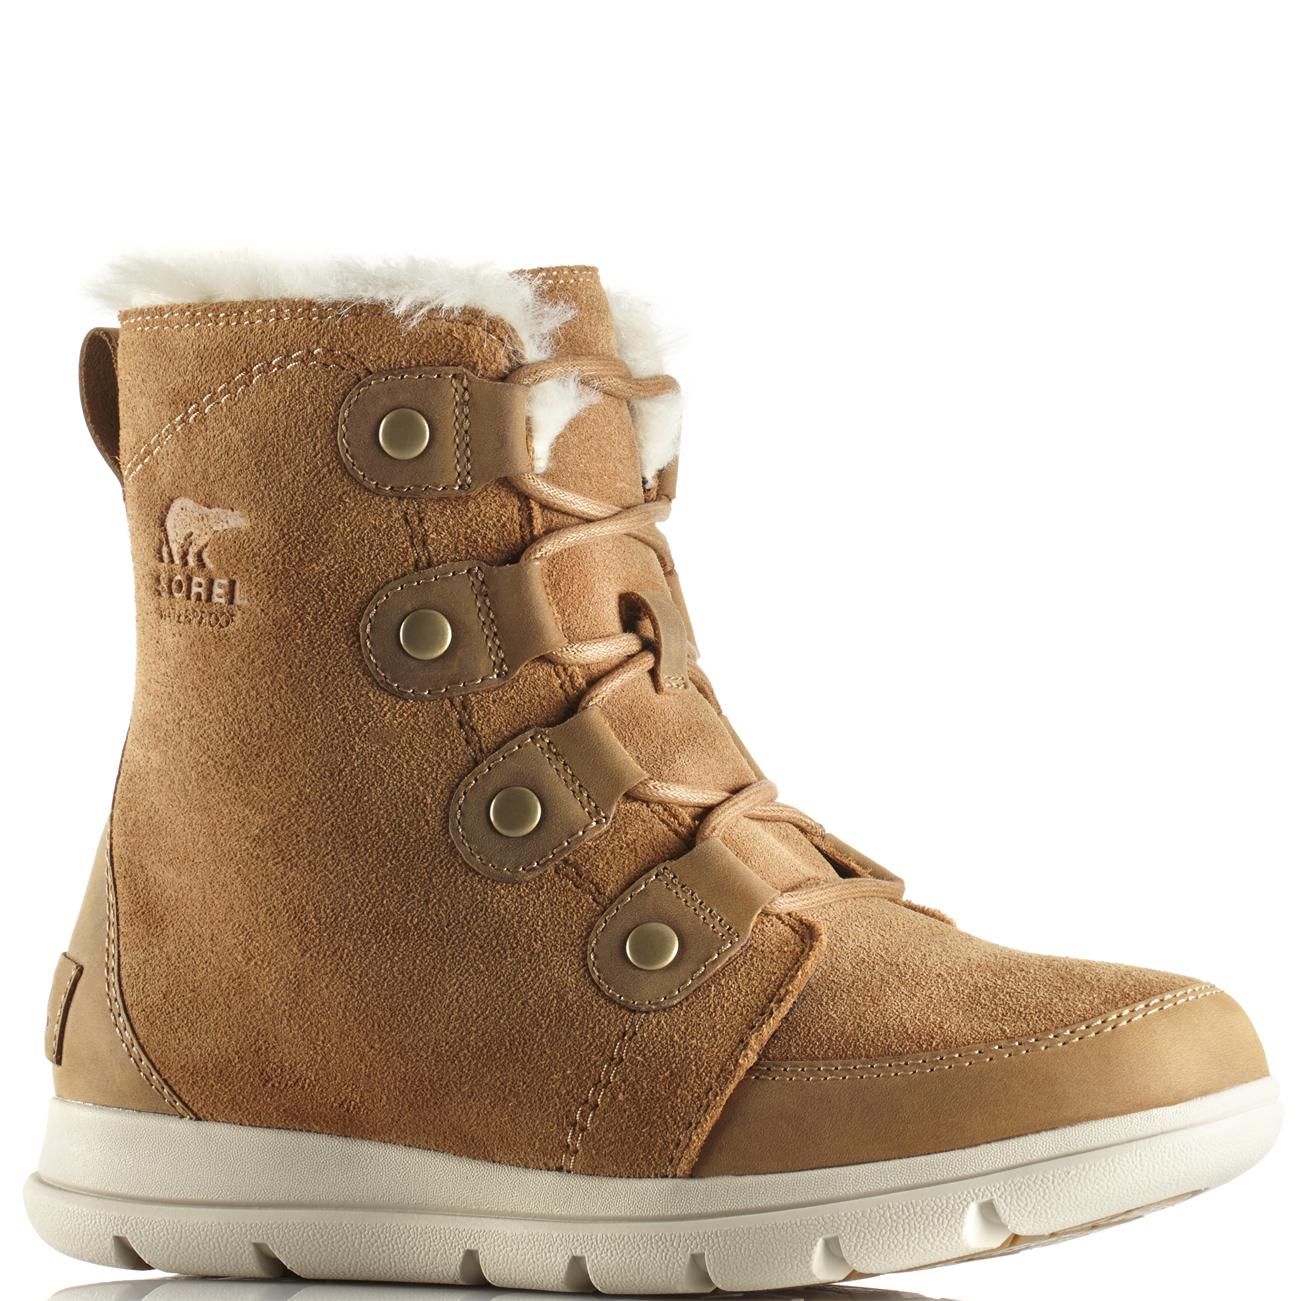 d52c92276f6 Womens Sorel Explorer Joan Snow Suede Rain Winter Ankle Waterproof Boots US  5-11